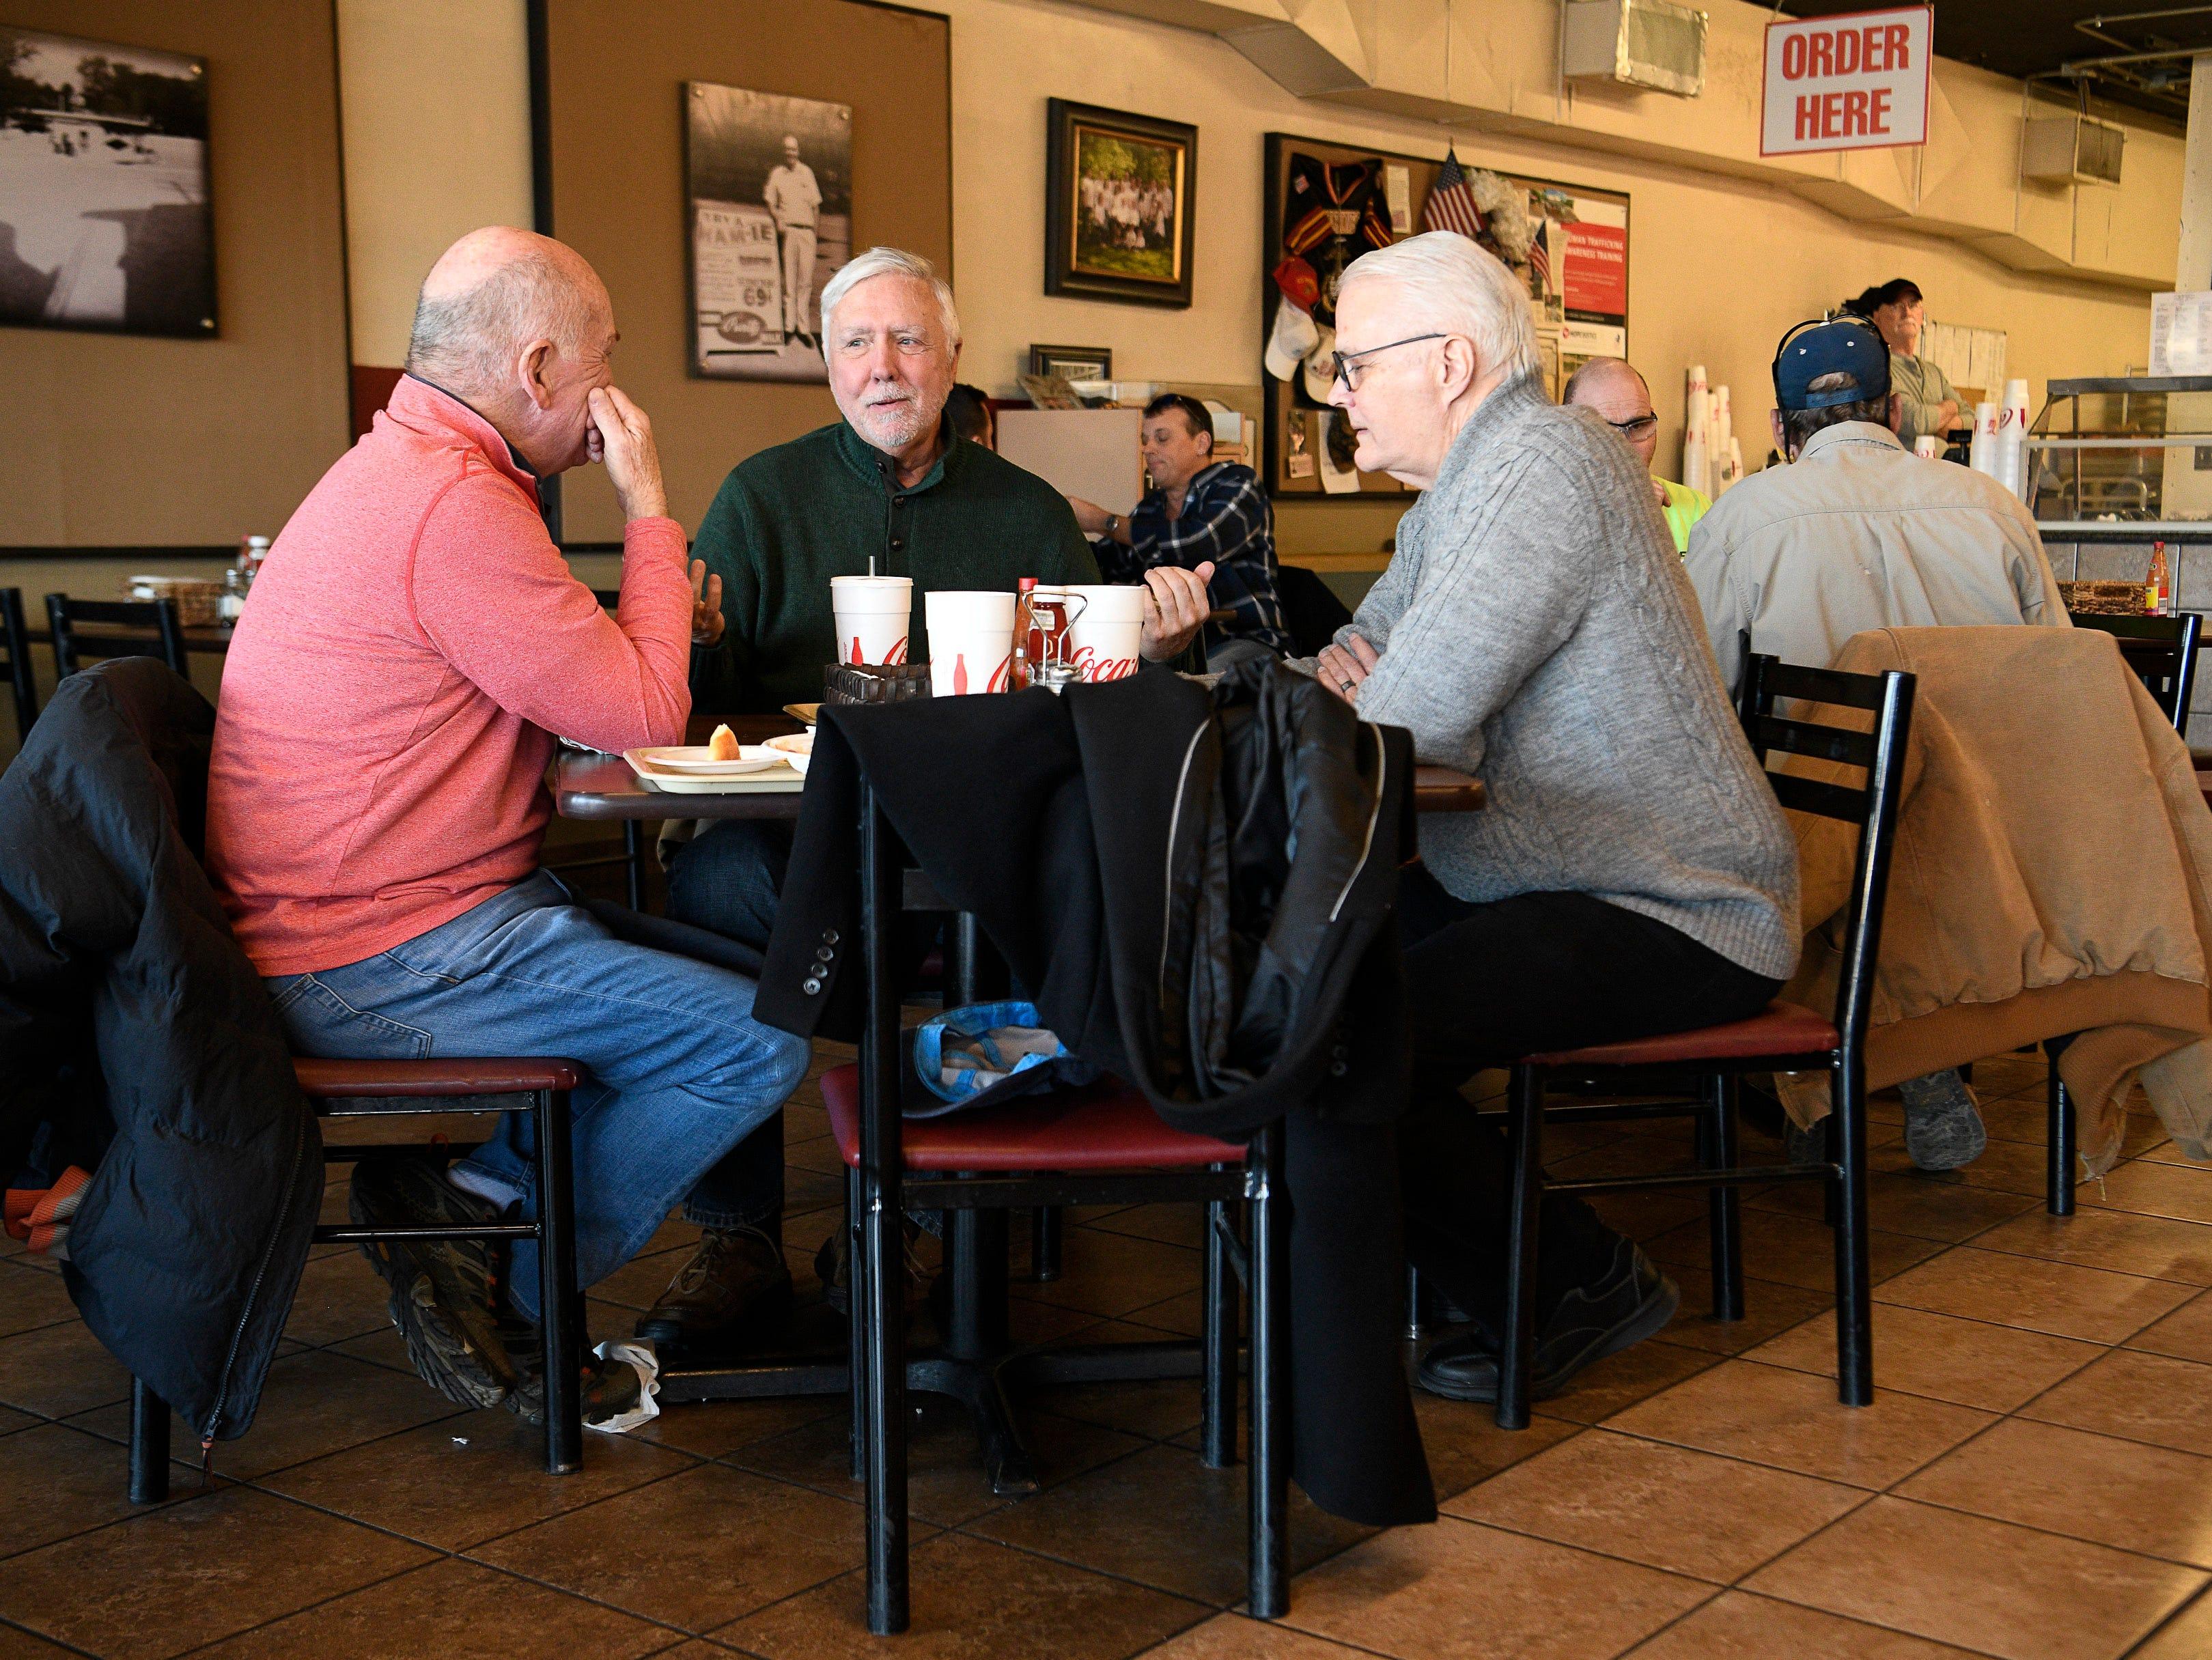 David Bradford, Gary Mills and Steve Smith enjoy lunch at Dairy King Wednesday Jan. 30, 2019 in Nashville, Tenn.